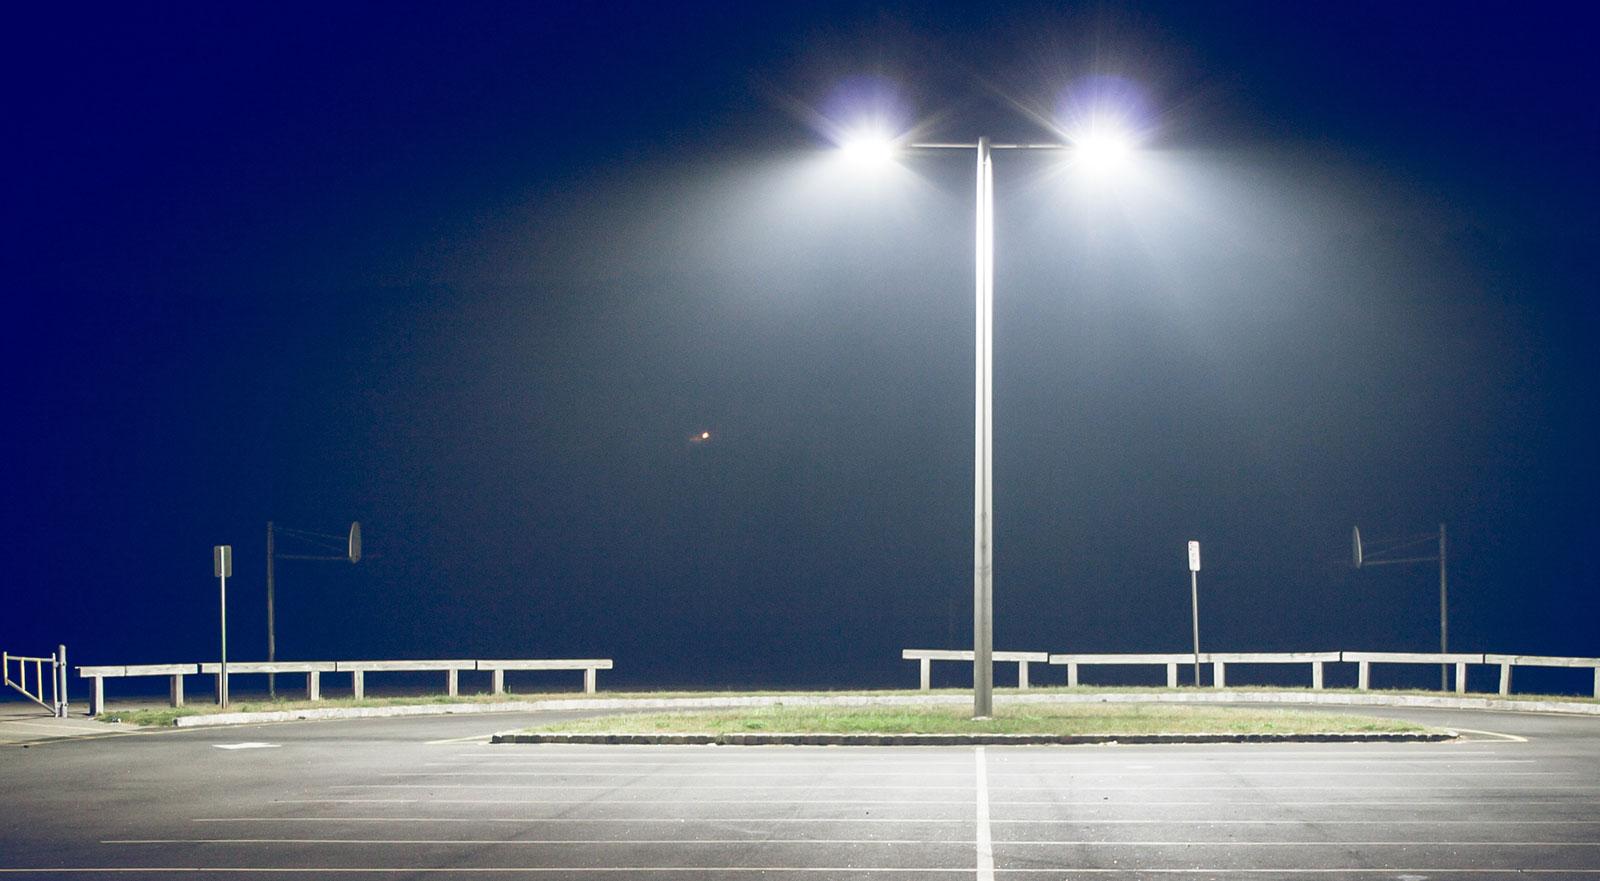 led lighting retrofits for parking lots and garages installed fast